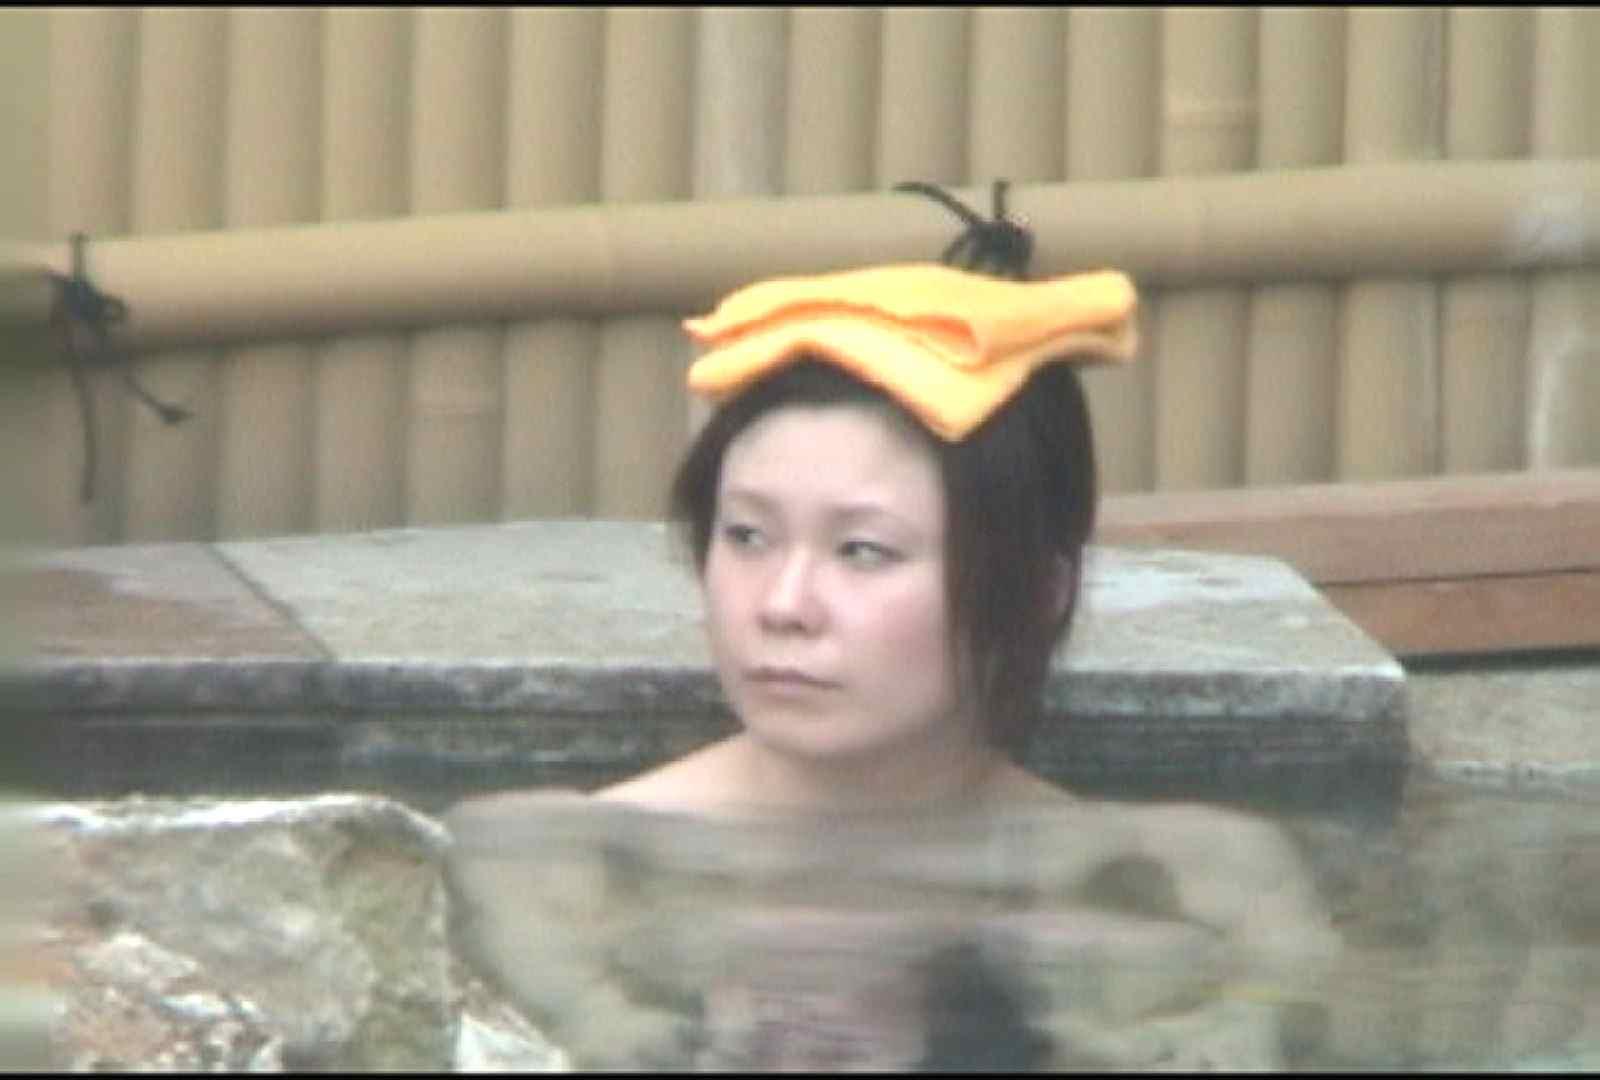 Aquaな露天風呂Vol.177 綺麗なOLたち アダルト動画キャプチャ 112枚 77